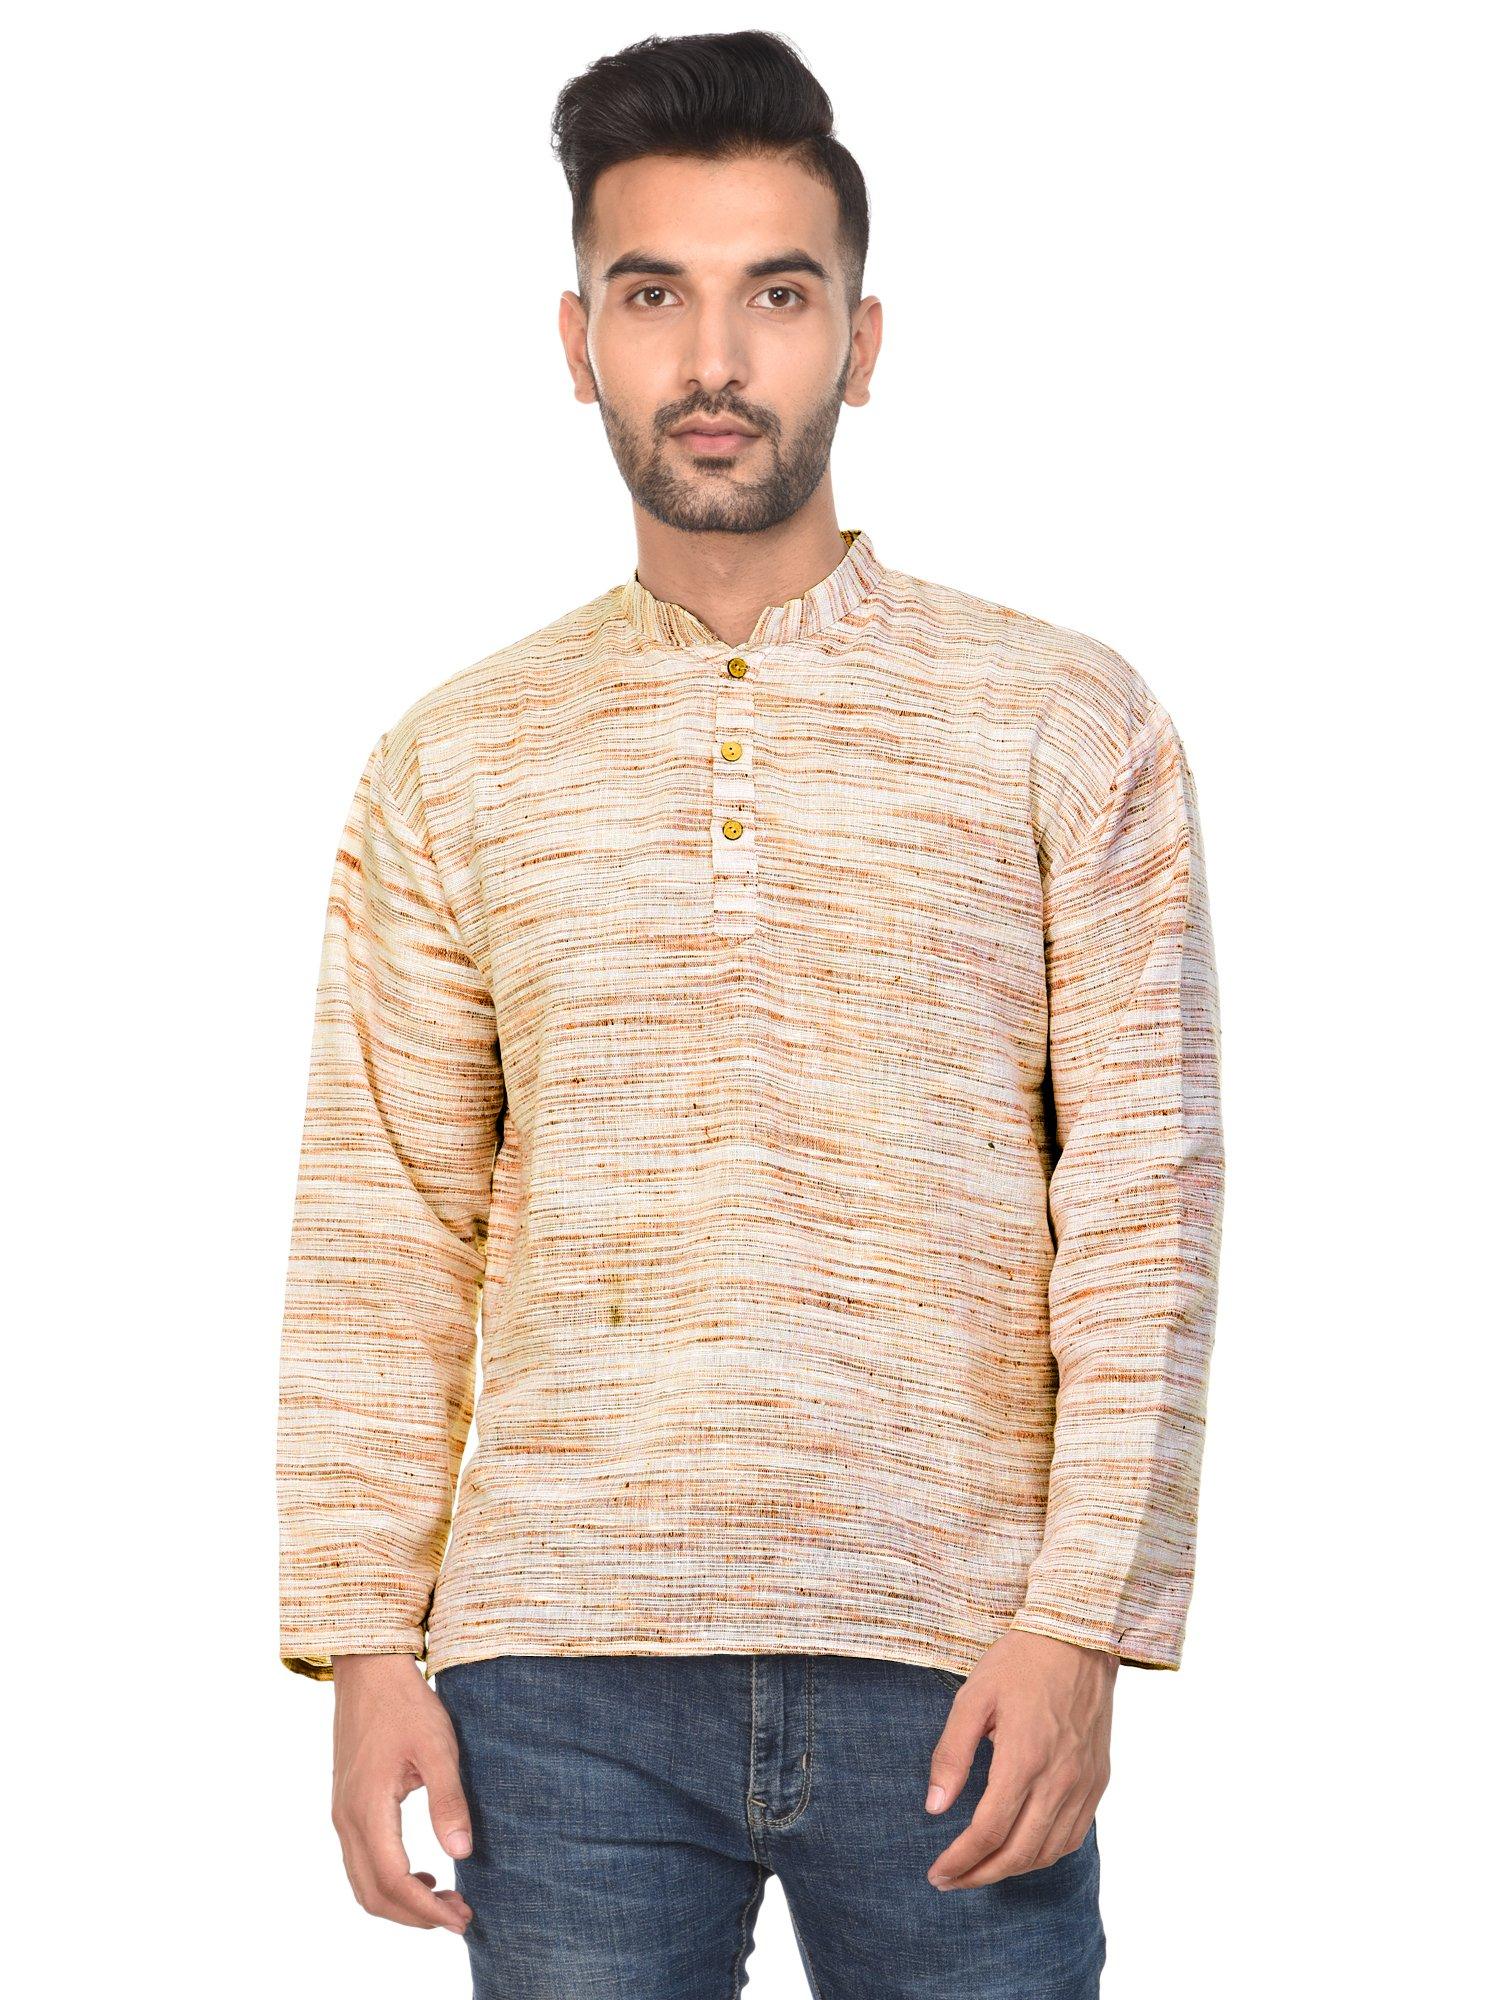 SKAVIJ Mens T- Shirt Kurta Long Sleeve Casual Button Down Cotton Tunic Kurta Dress